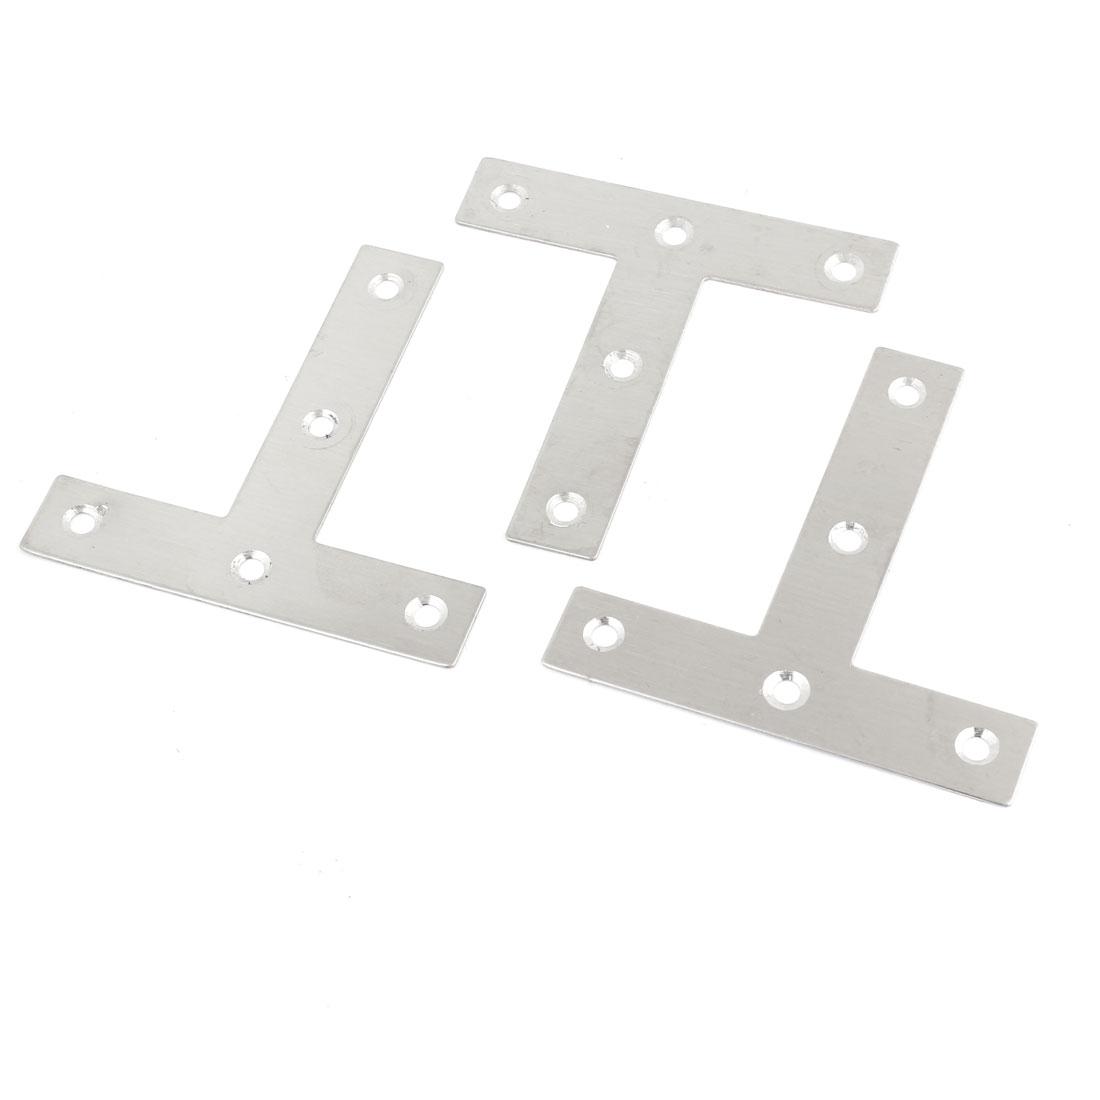 80mm x 80mm Stainless Steel T Shape Angle Bracket 3pcs